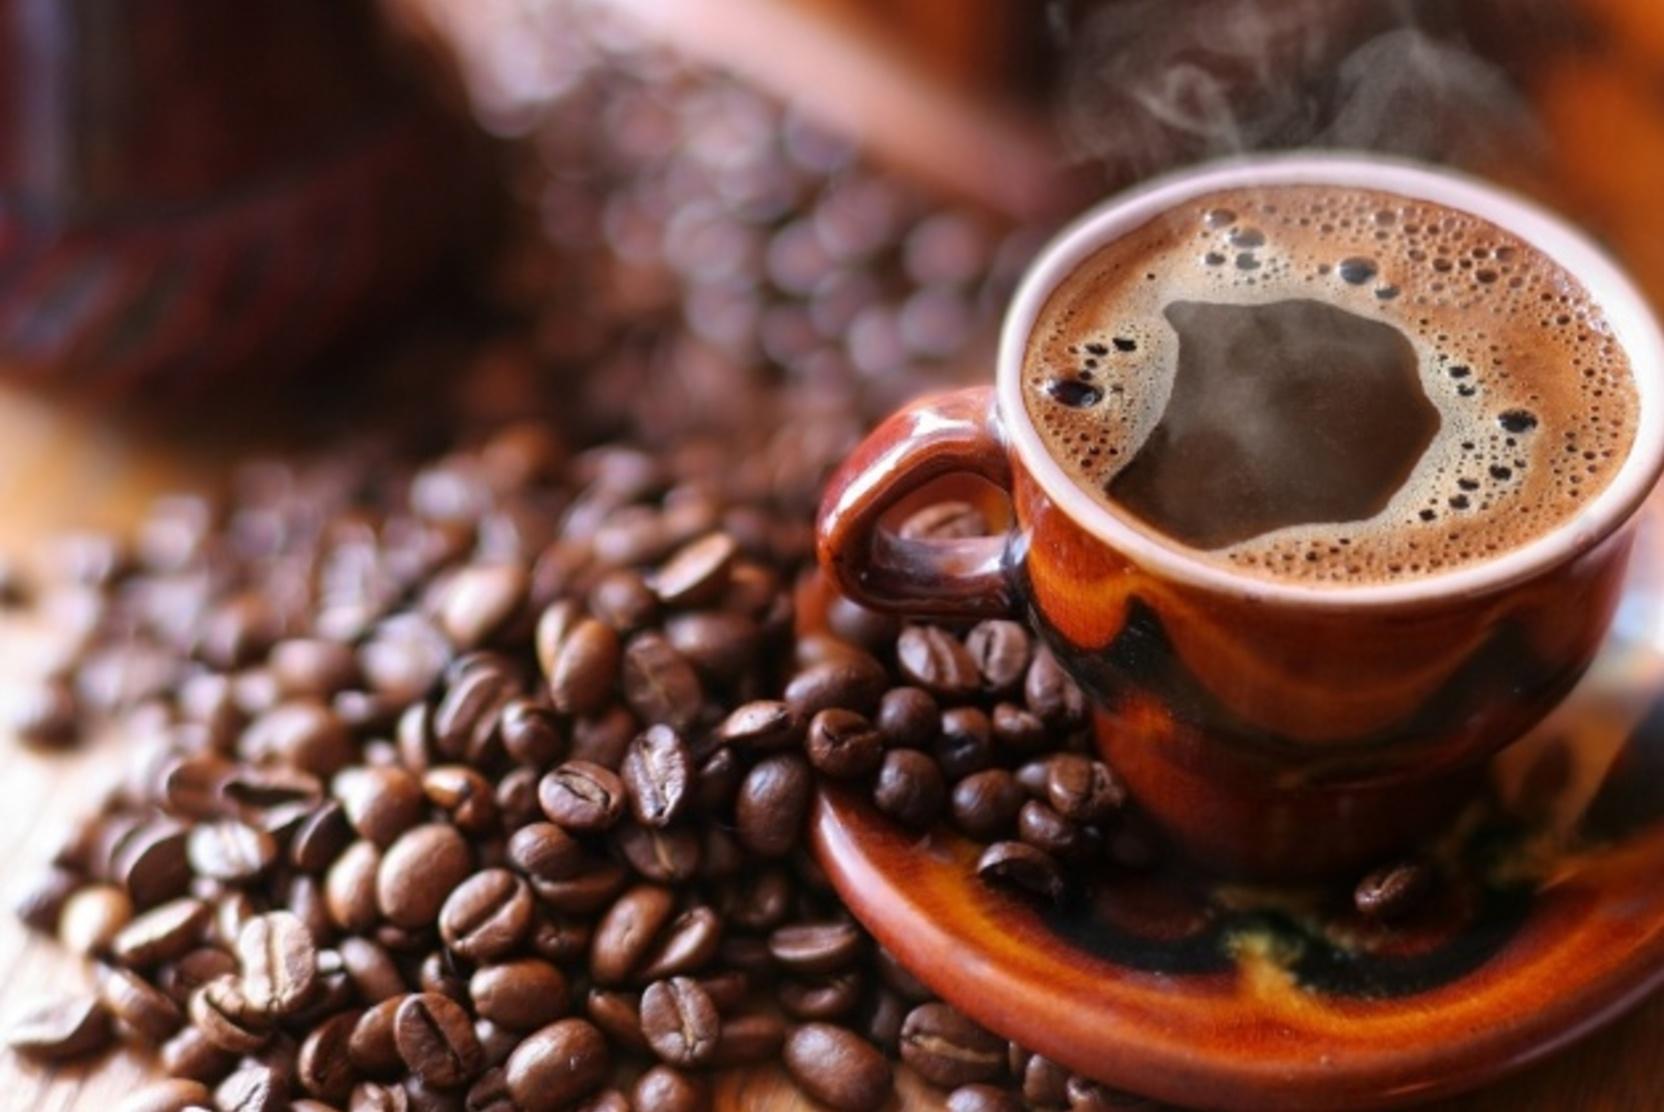 Доктор предупредил об опасности кофе по утрам